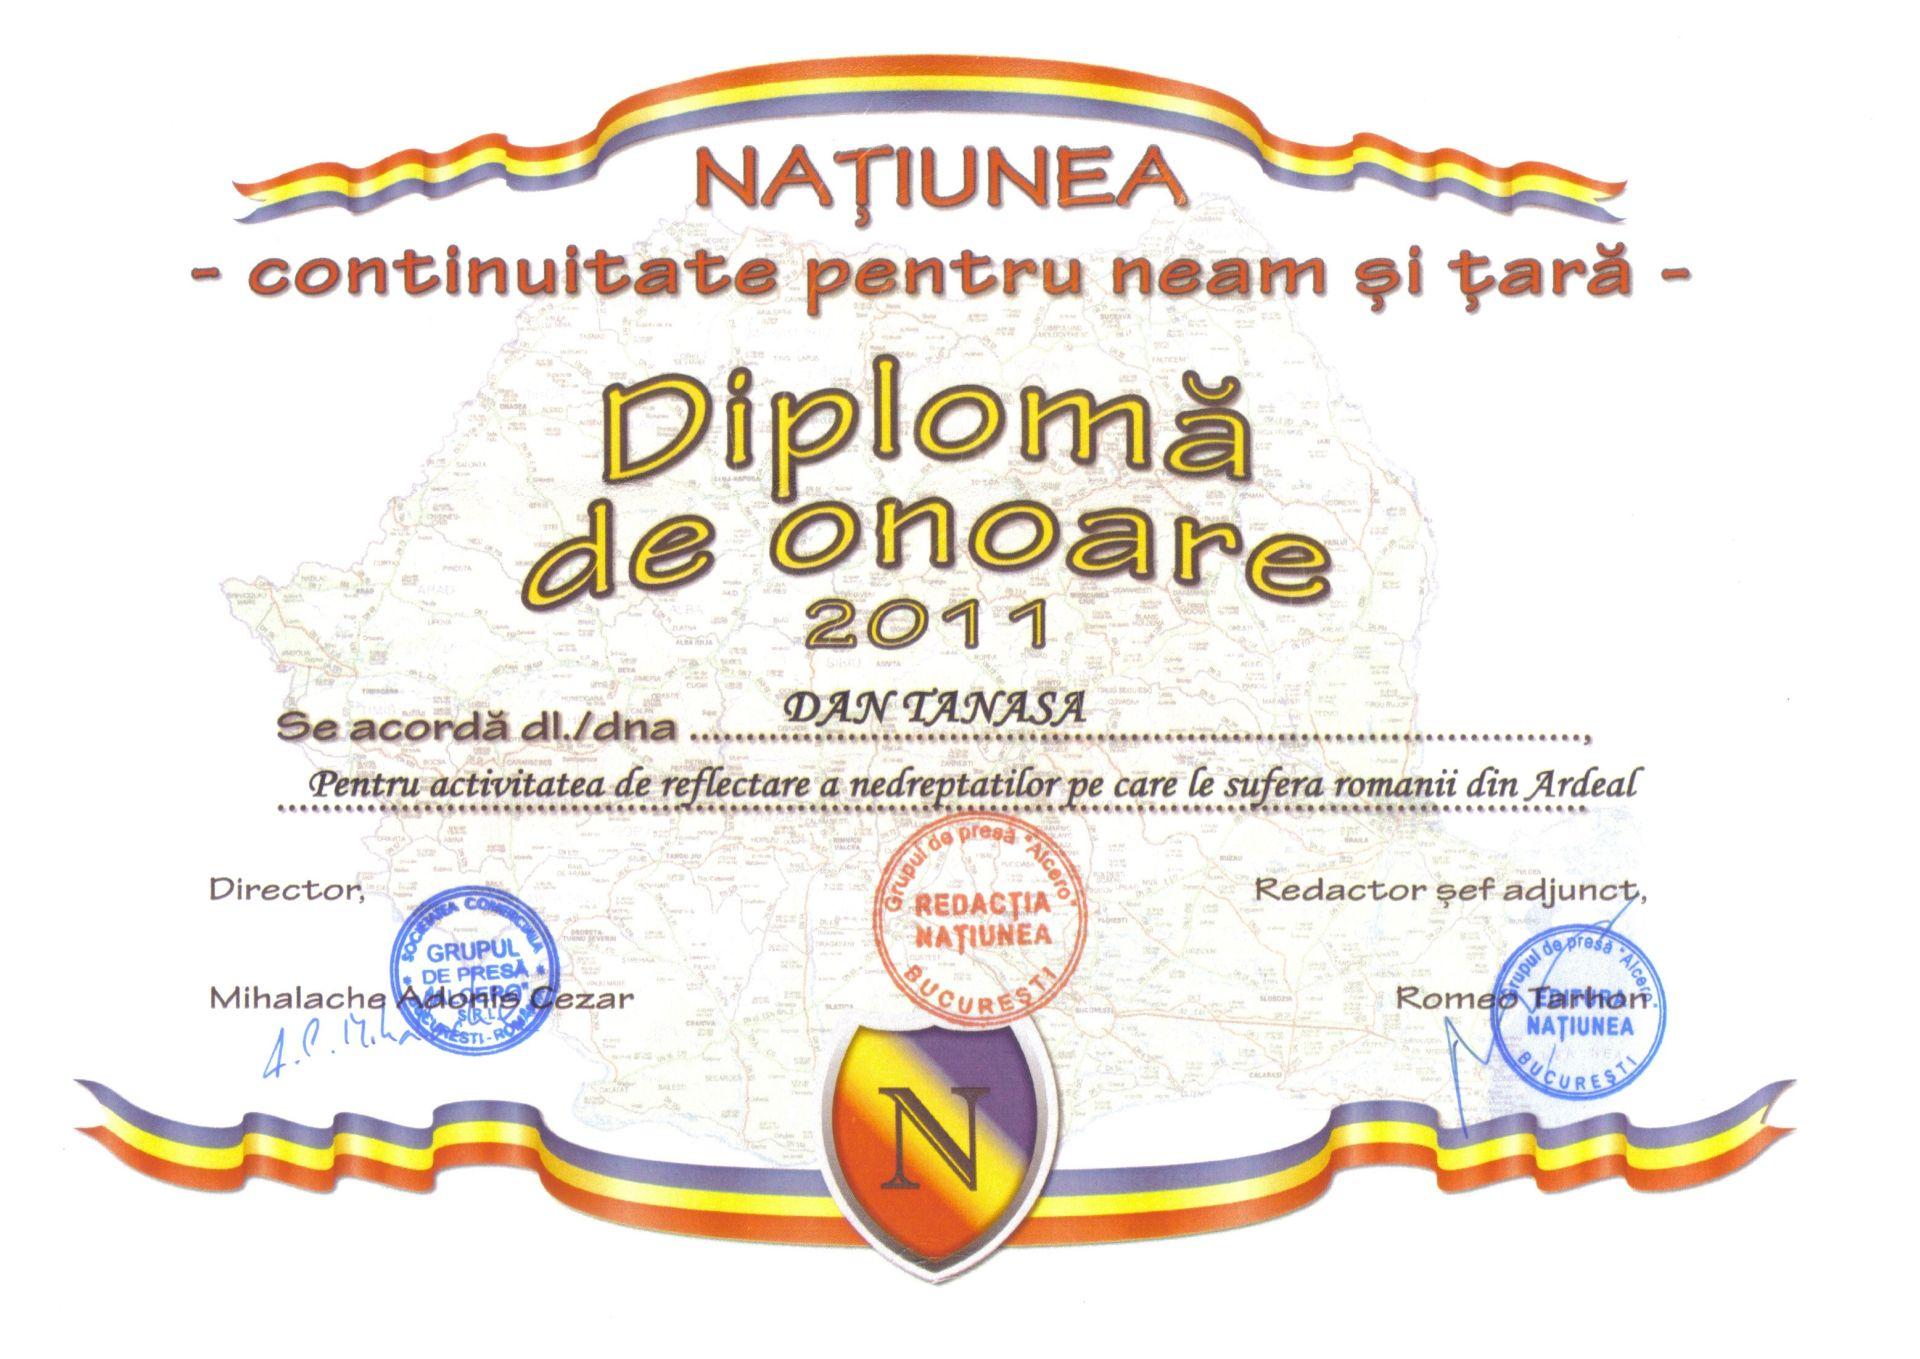 diploma dan tanasa 2011 Natiunea